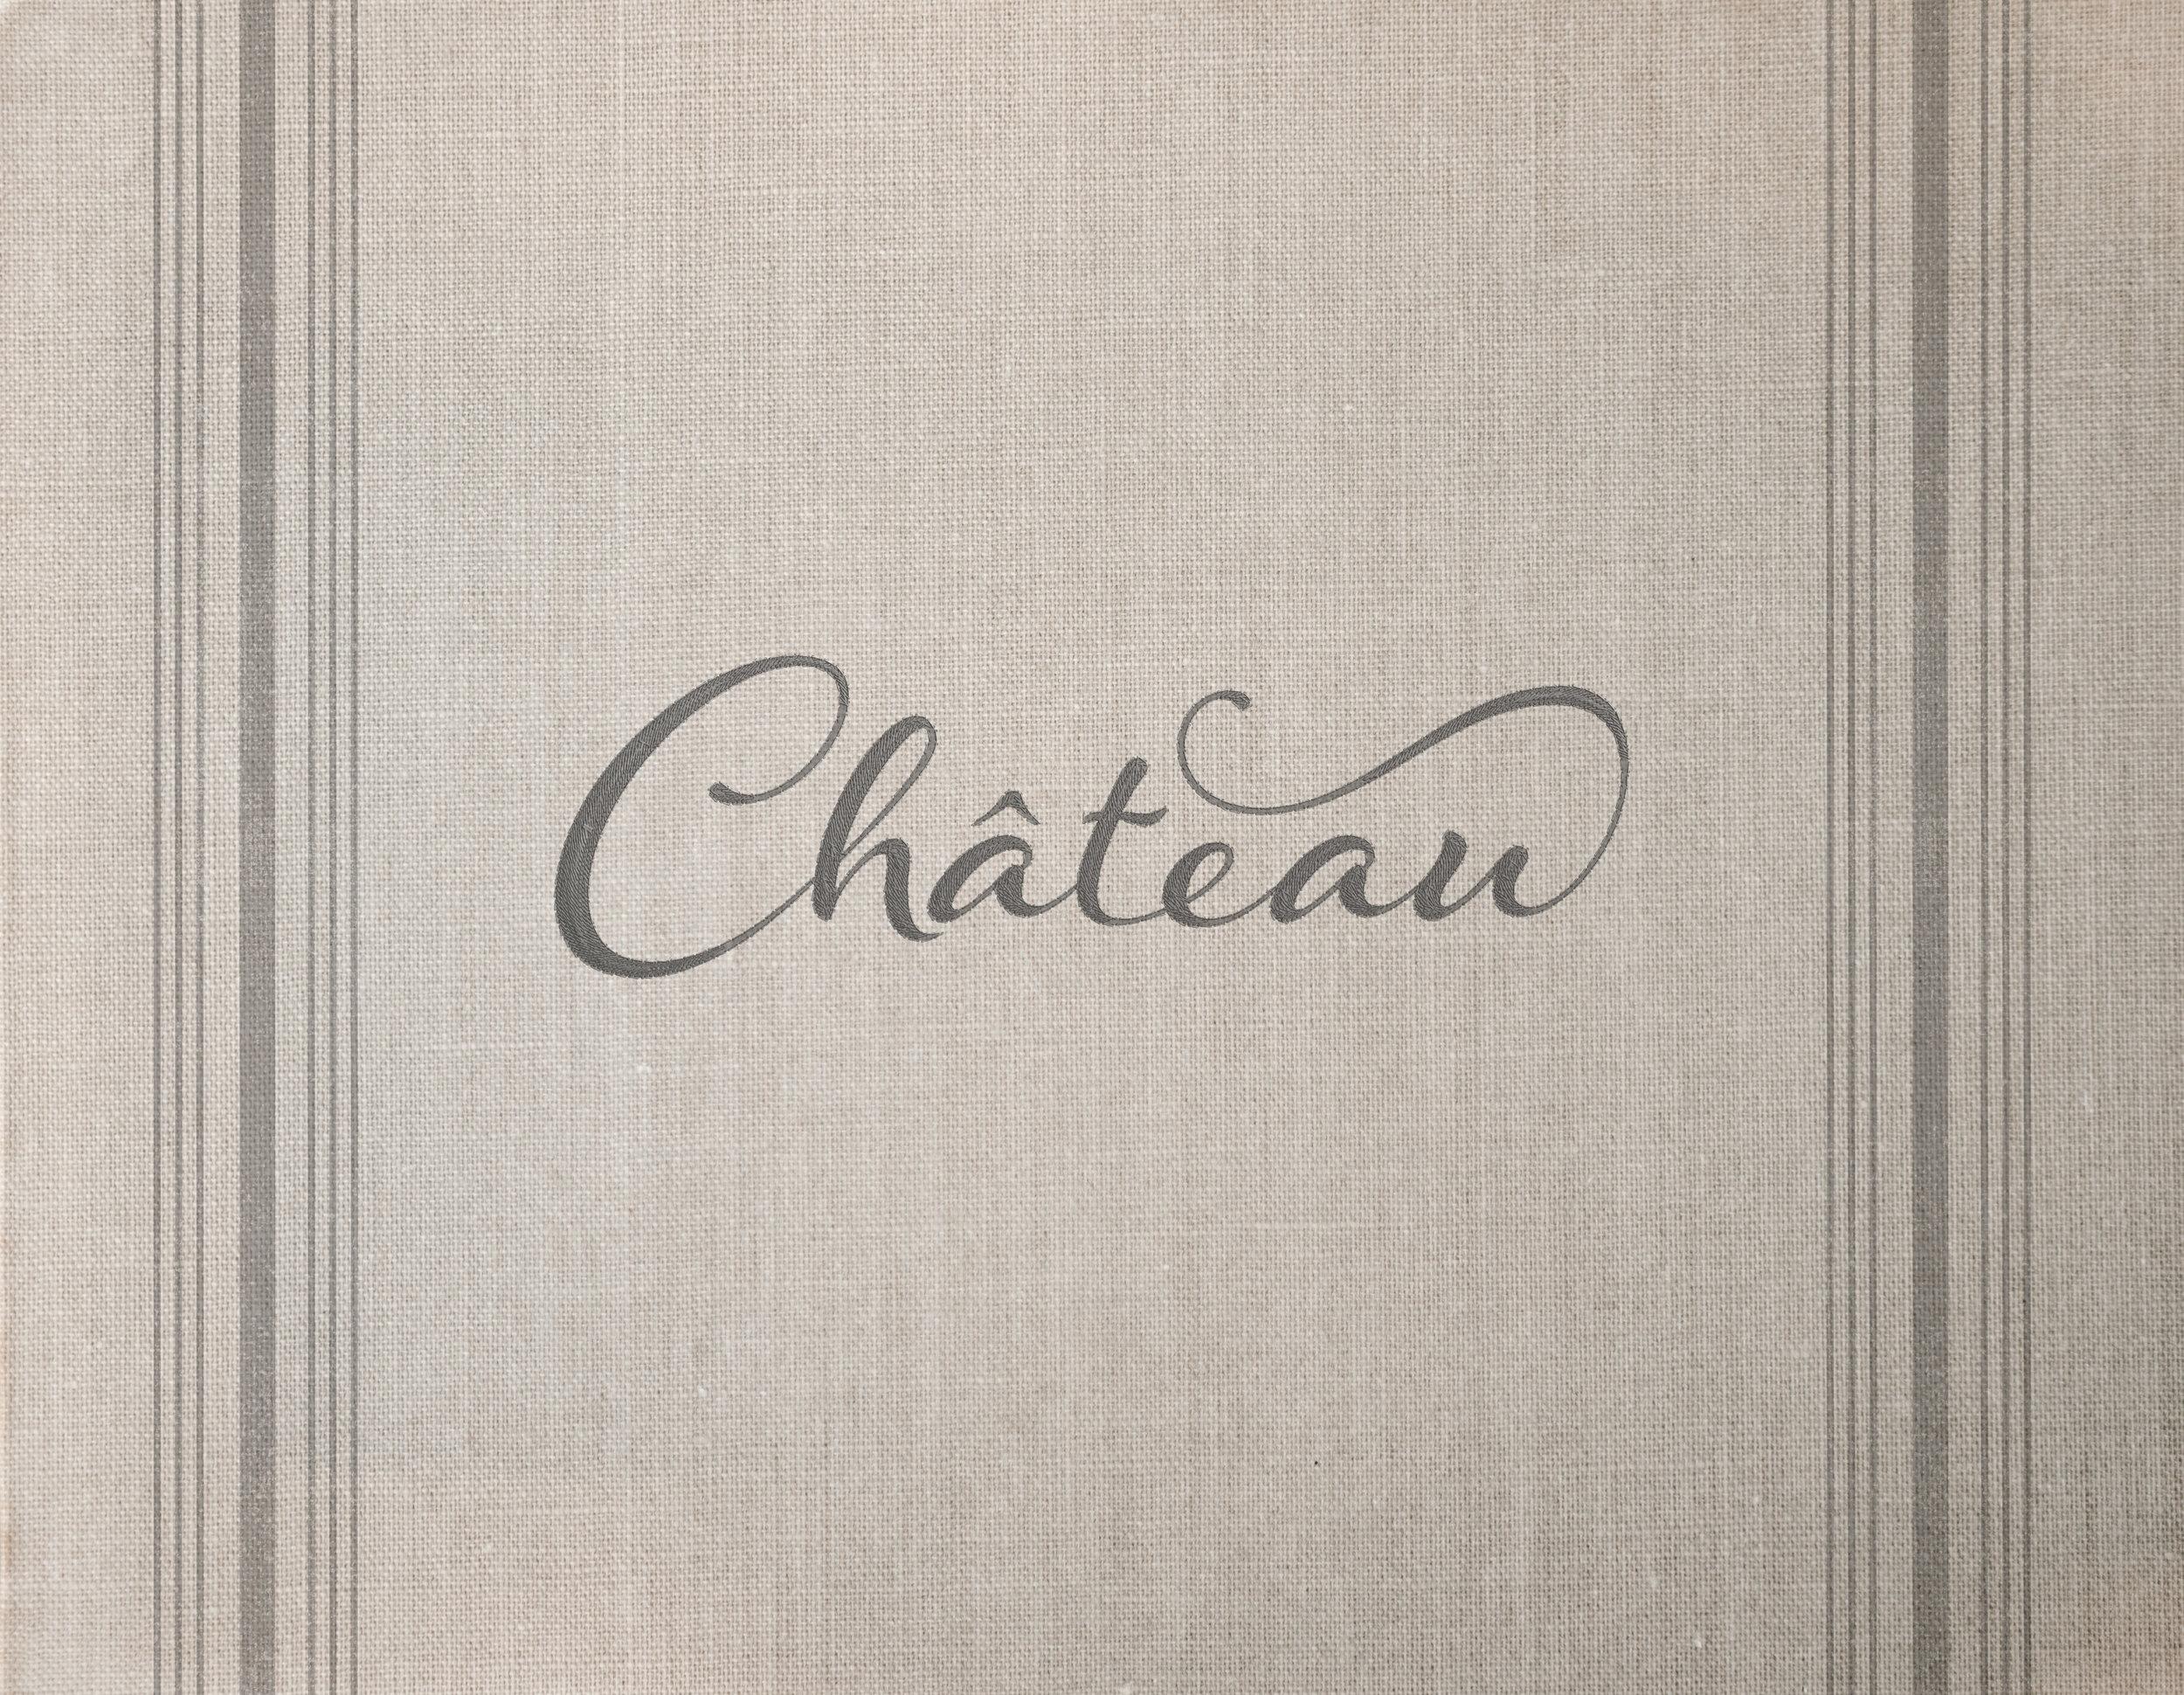 Chateau Image.jpg